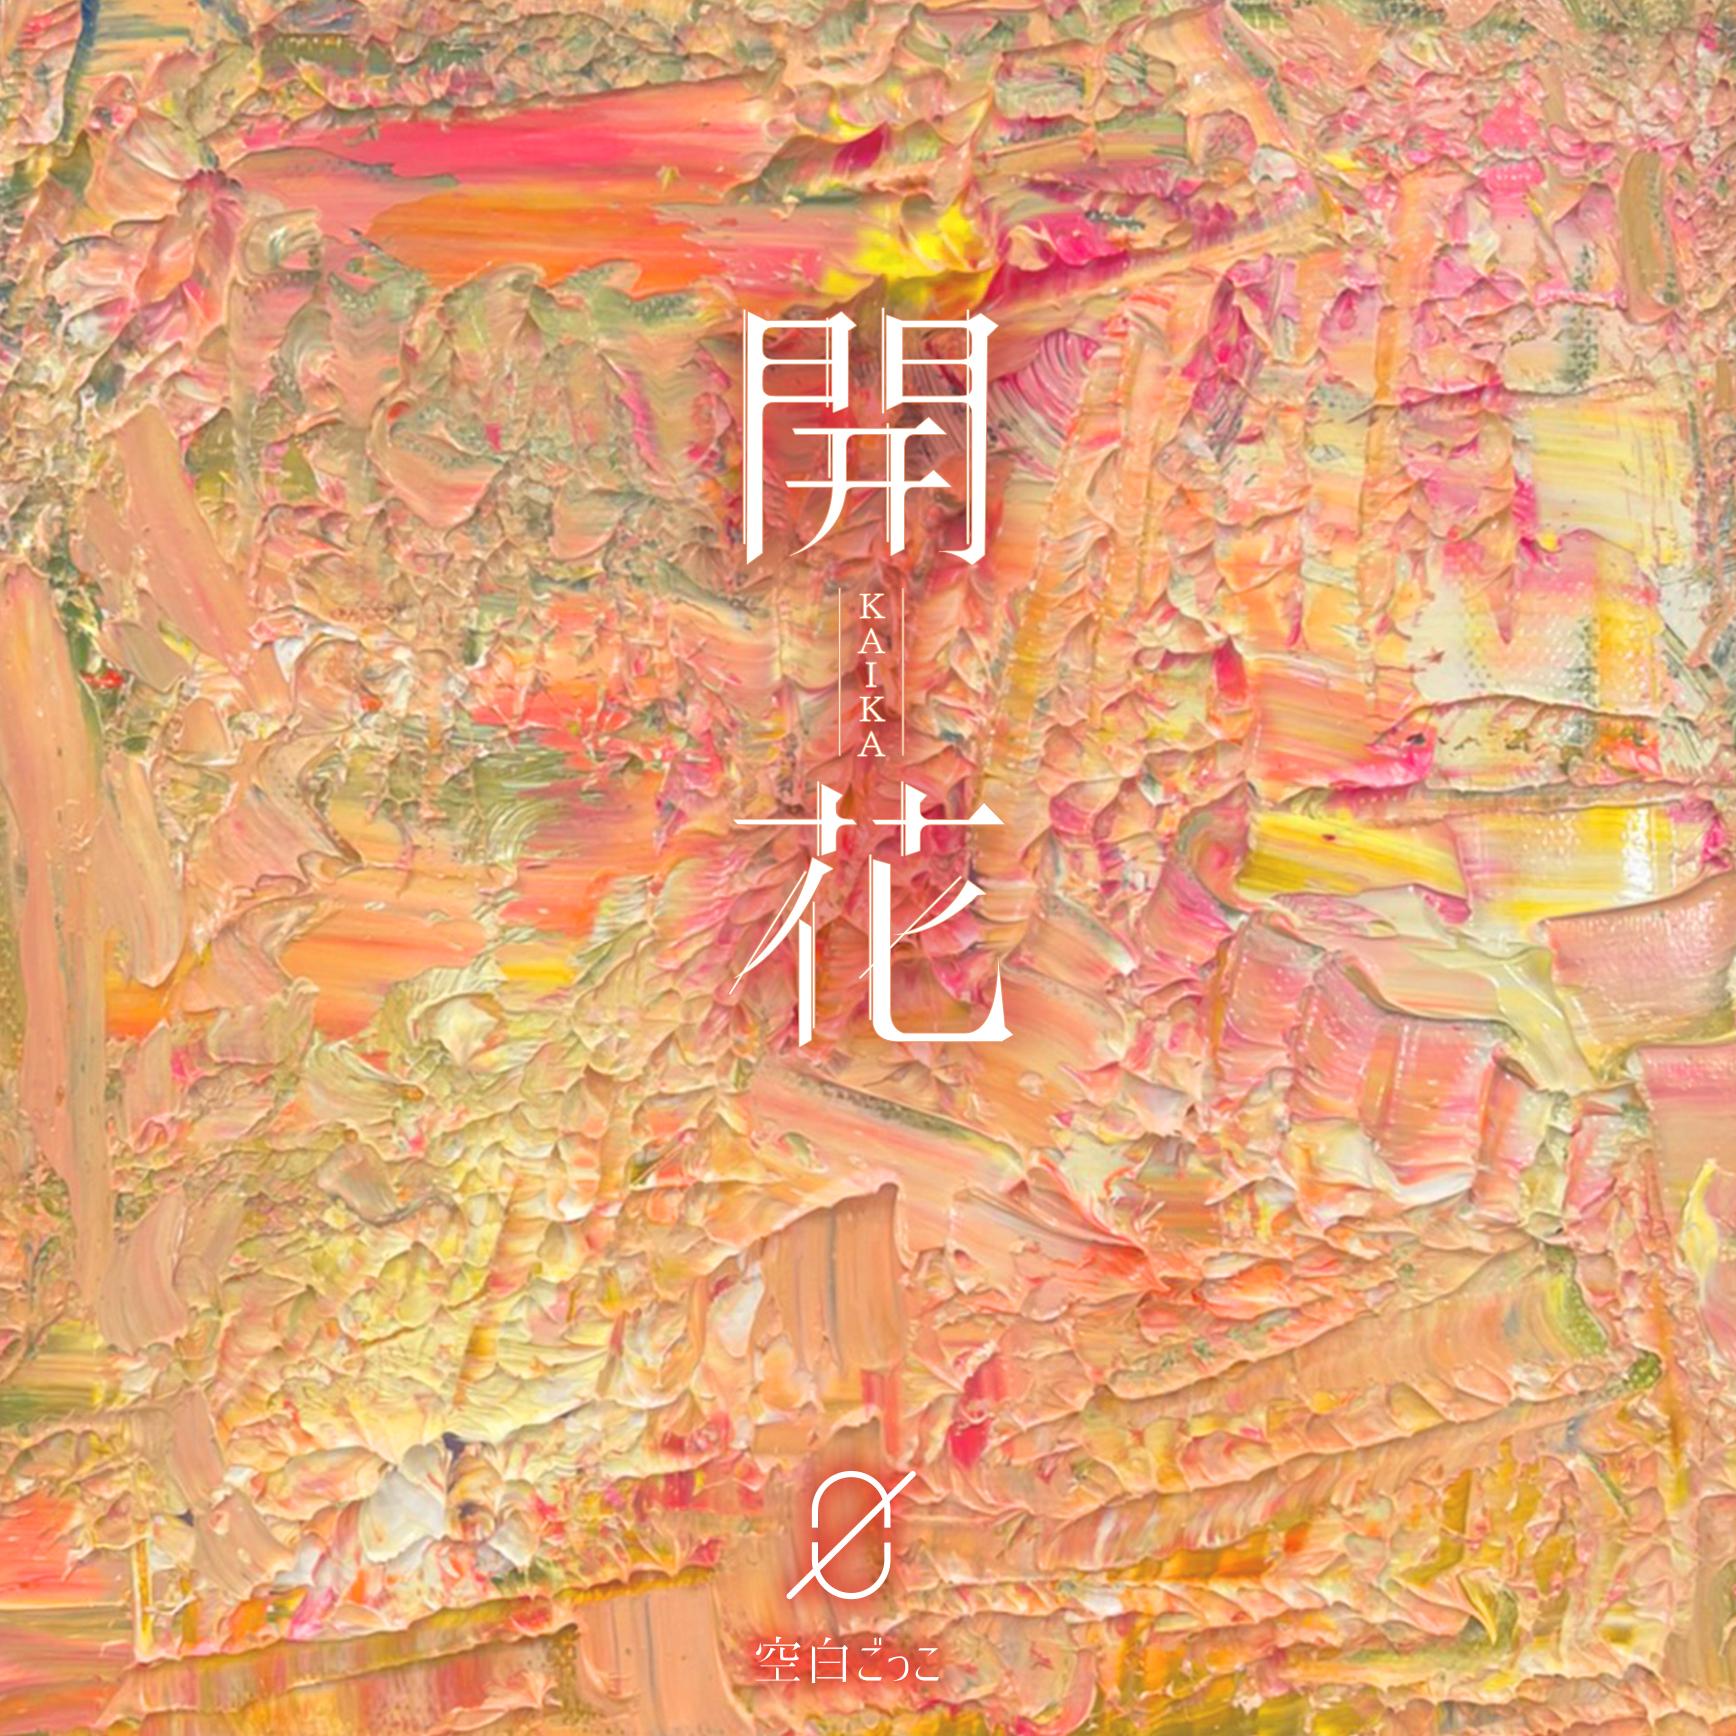 "【Ponycanyon Online Limited Version】Kuhaku Gokko 2nd Album ""Kaika"" Limited Edition (CD+DVD) Release in Oct 20,2021"